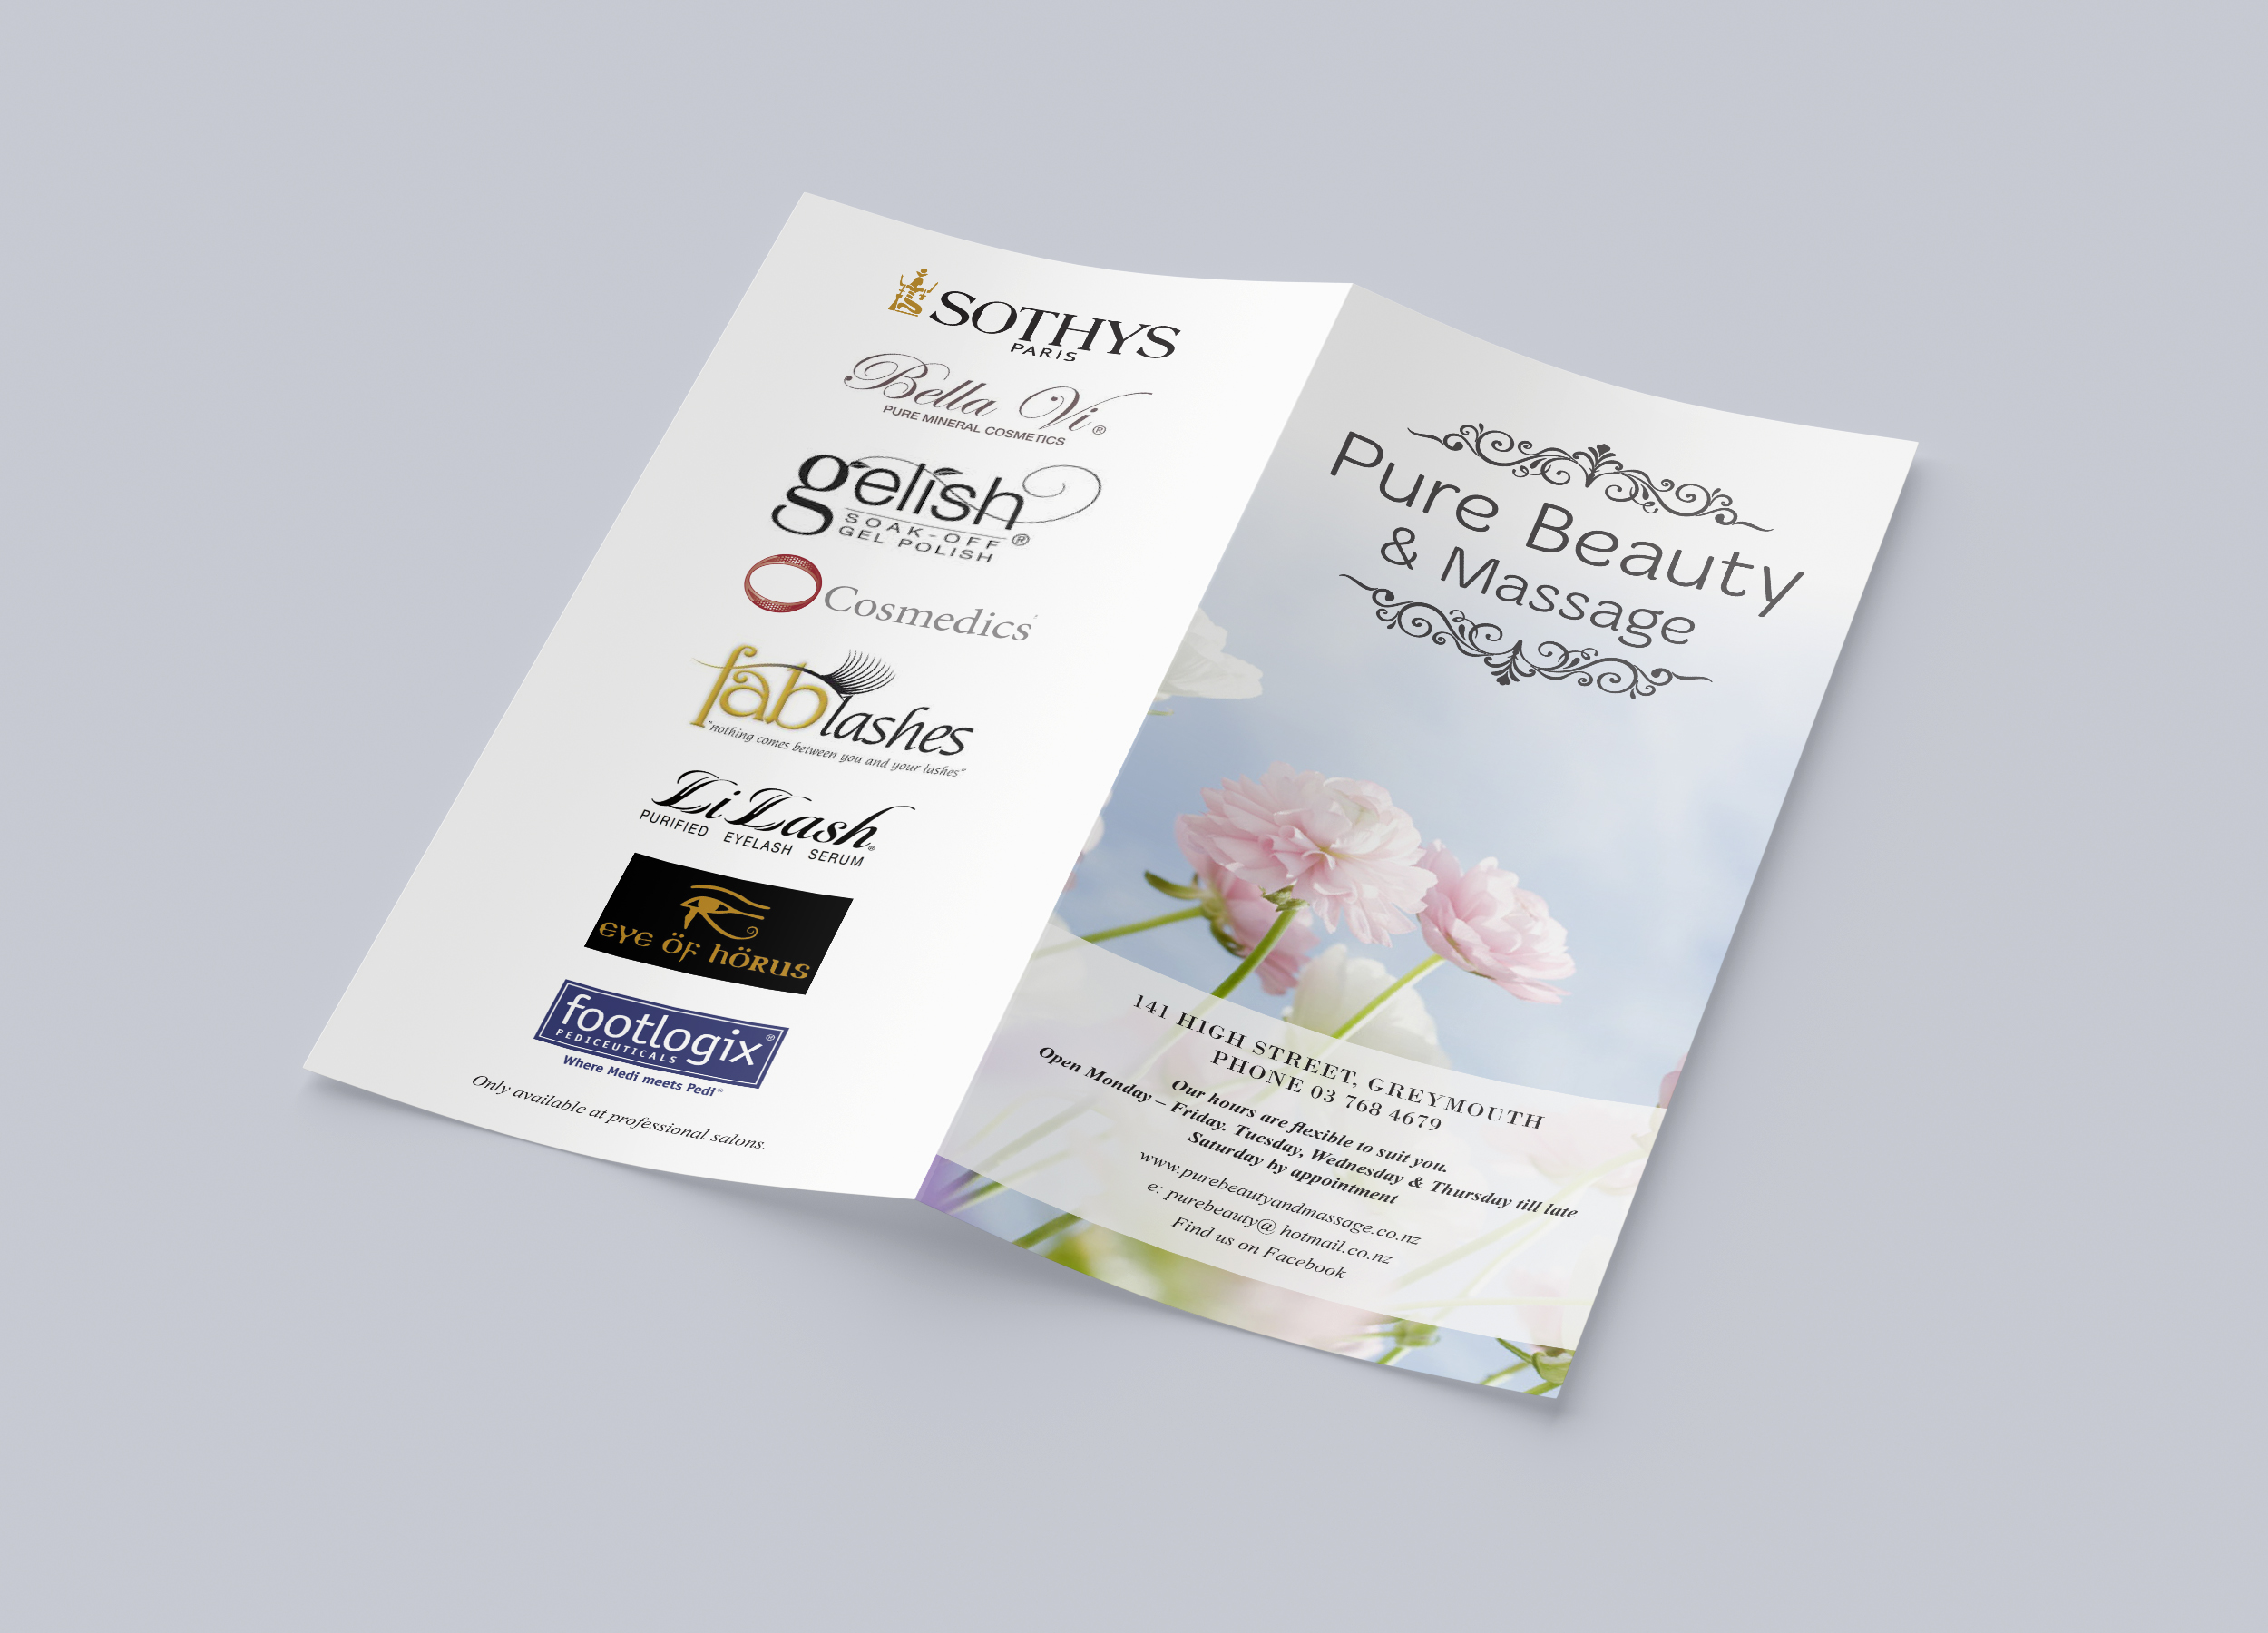 Pure Beauty & Massage Brochure Design